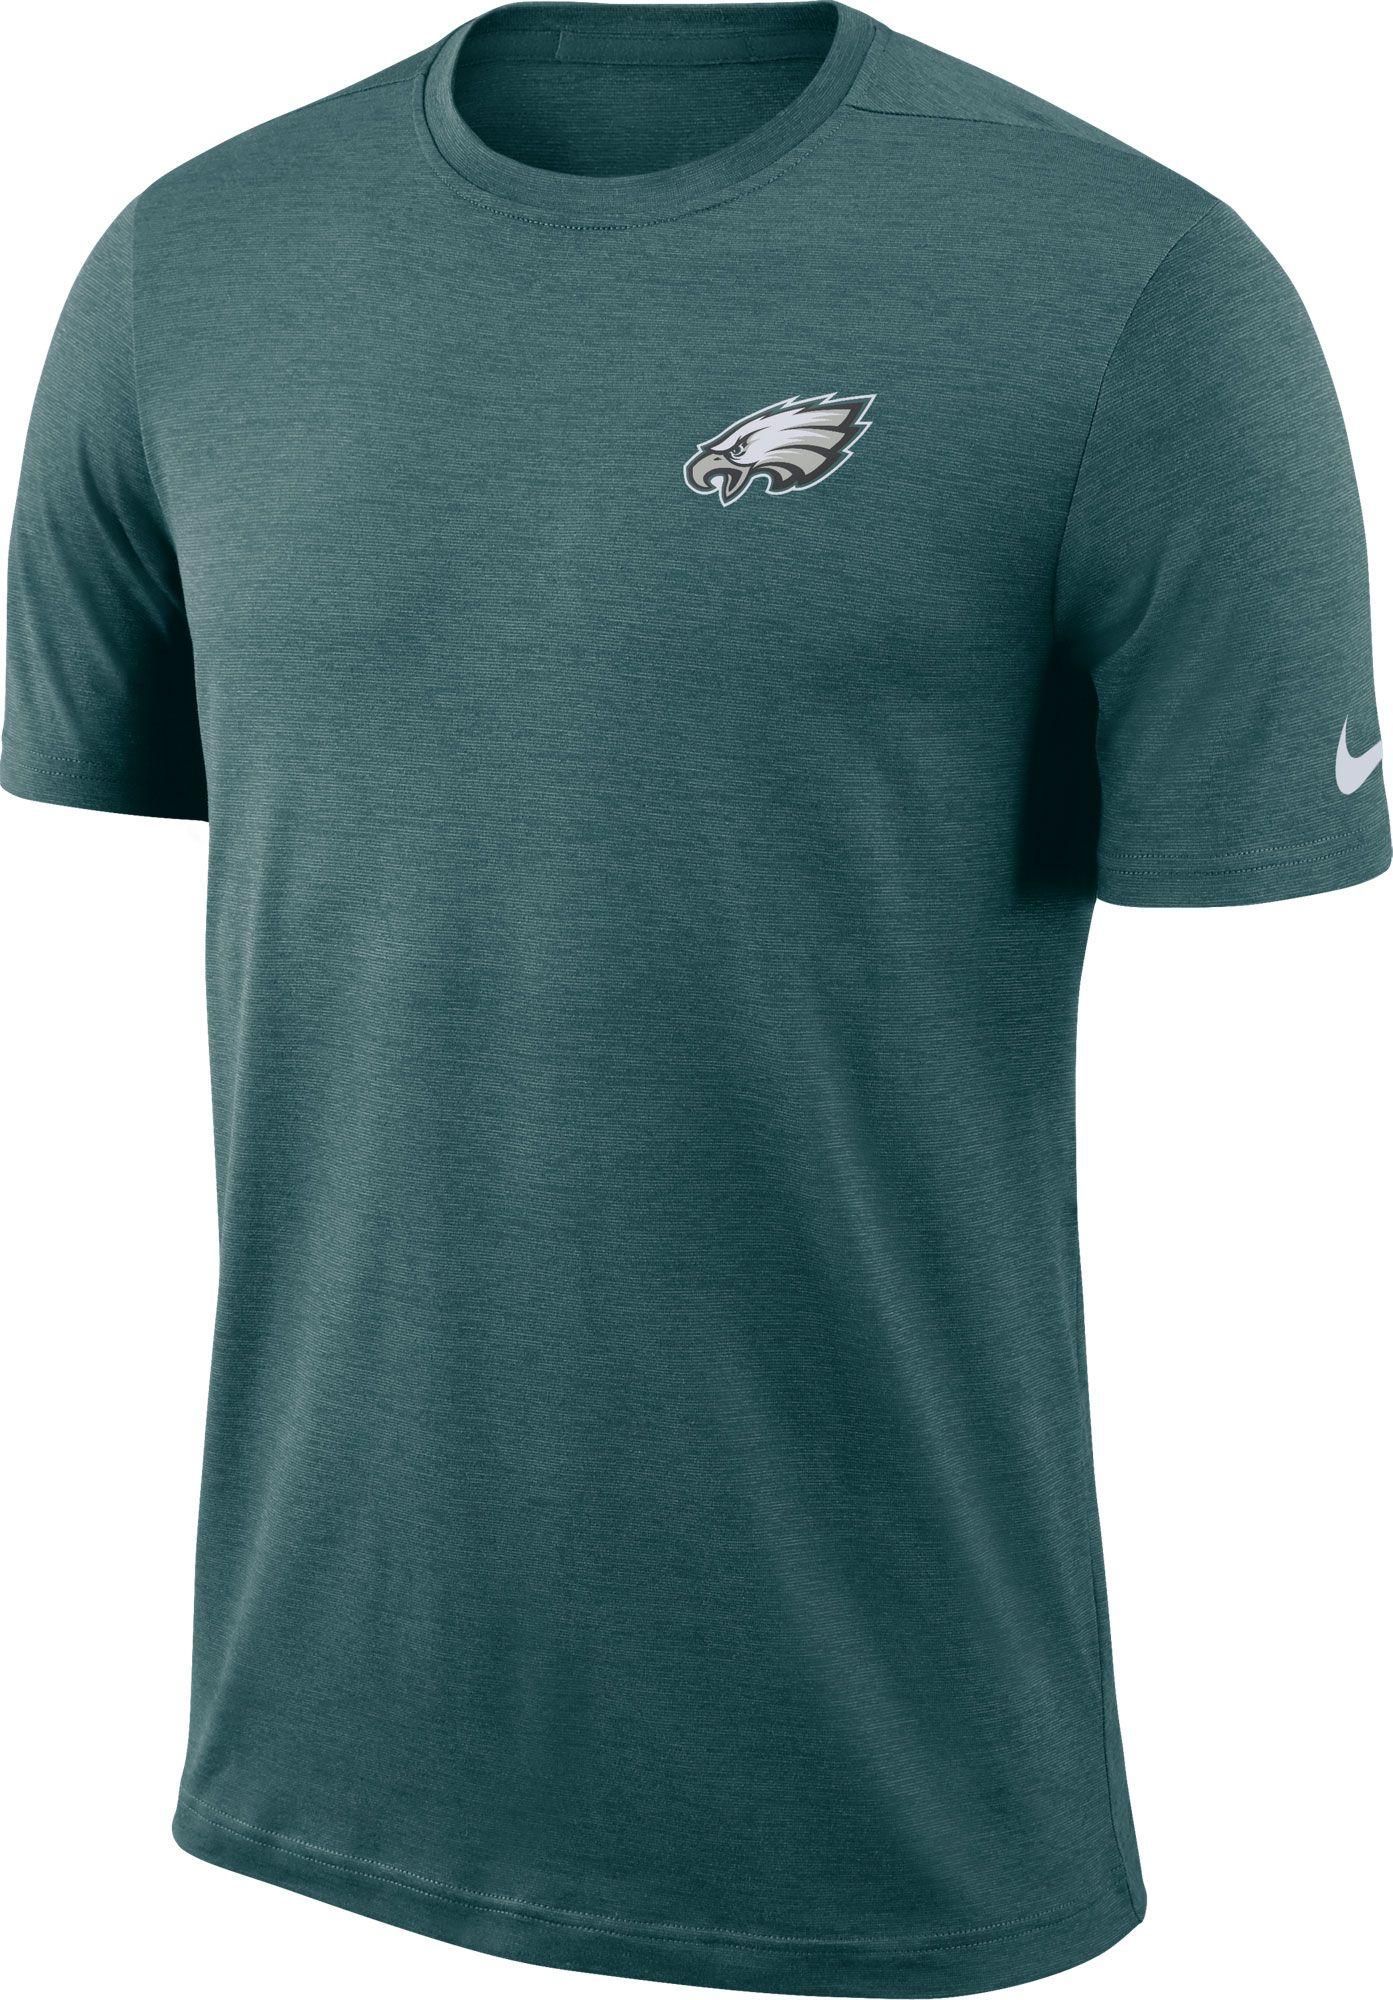 d8f8785660317 Nike Men s Philadelphia Eagles Sideline Coaches Performance Green T ...